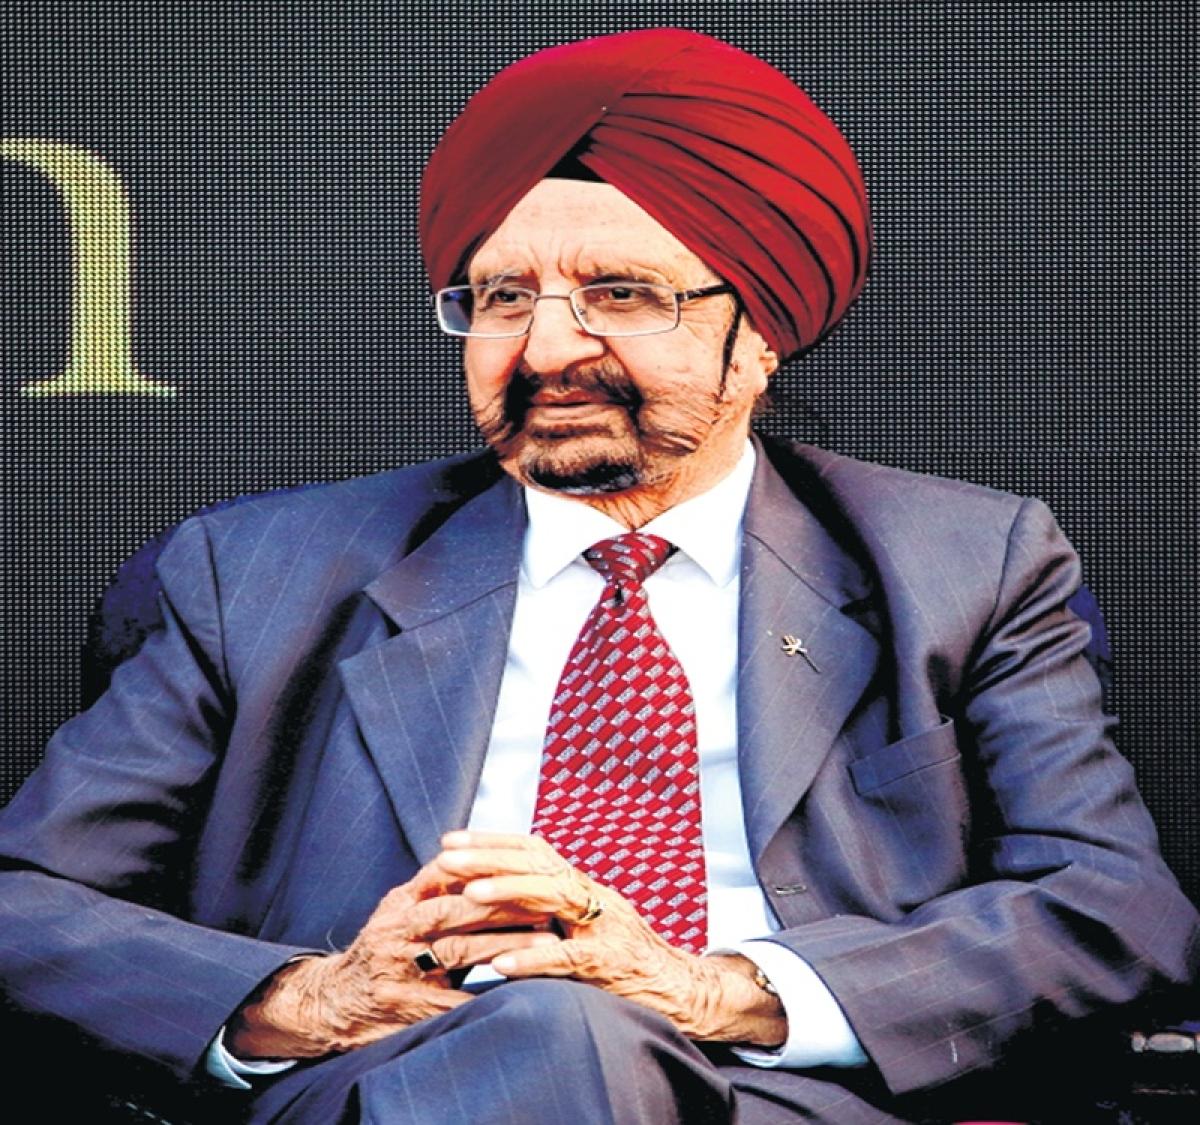 No regrets at missing out on Padma Shri: Gurbux Singh